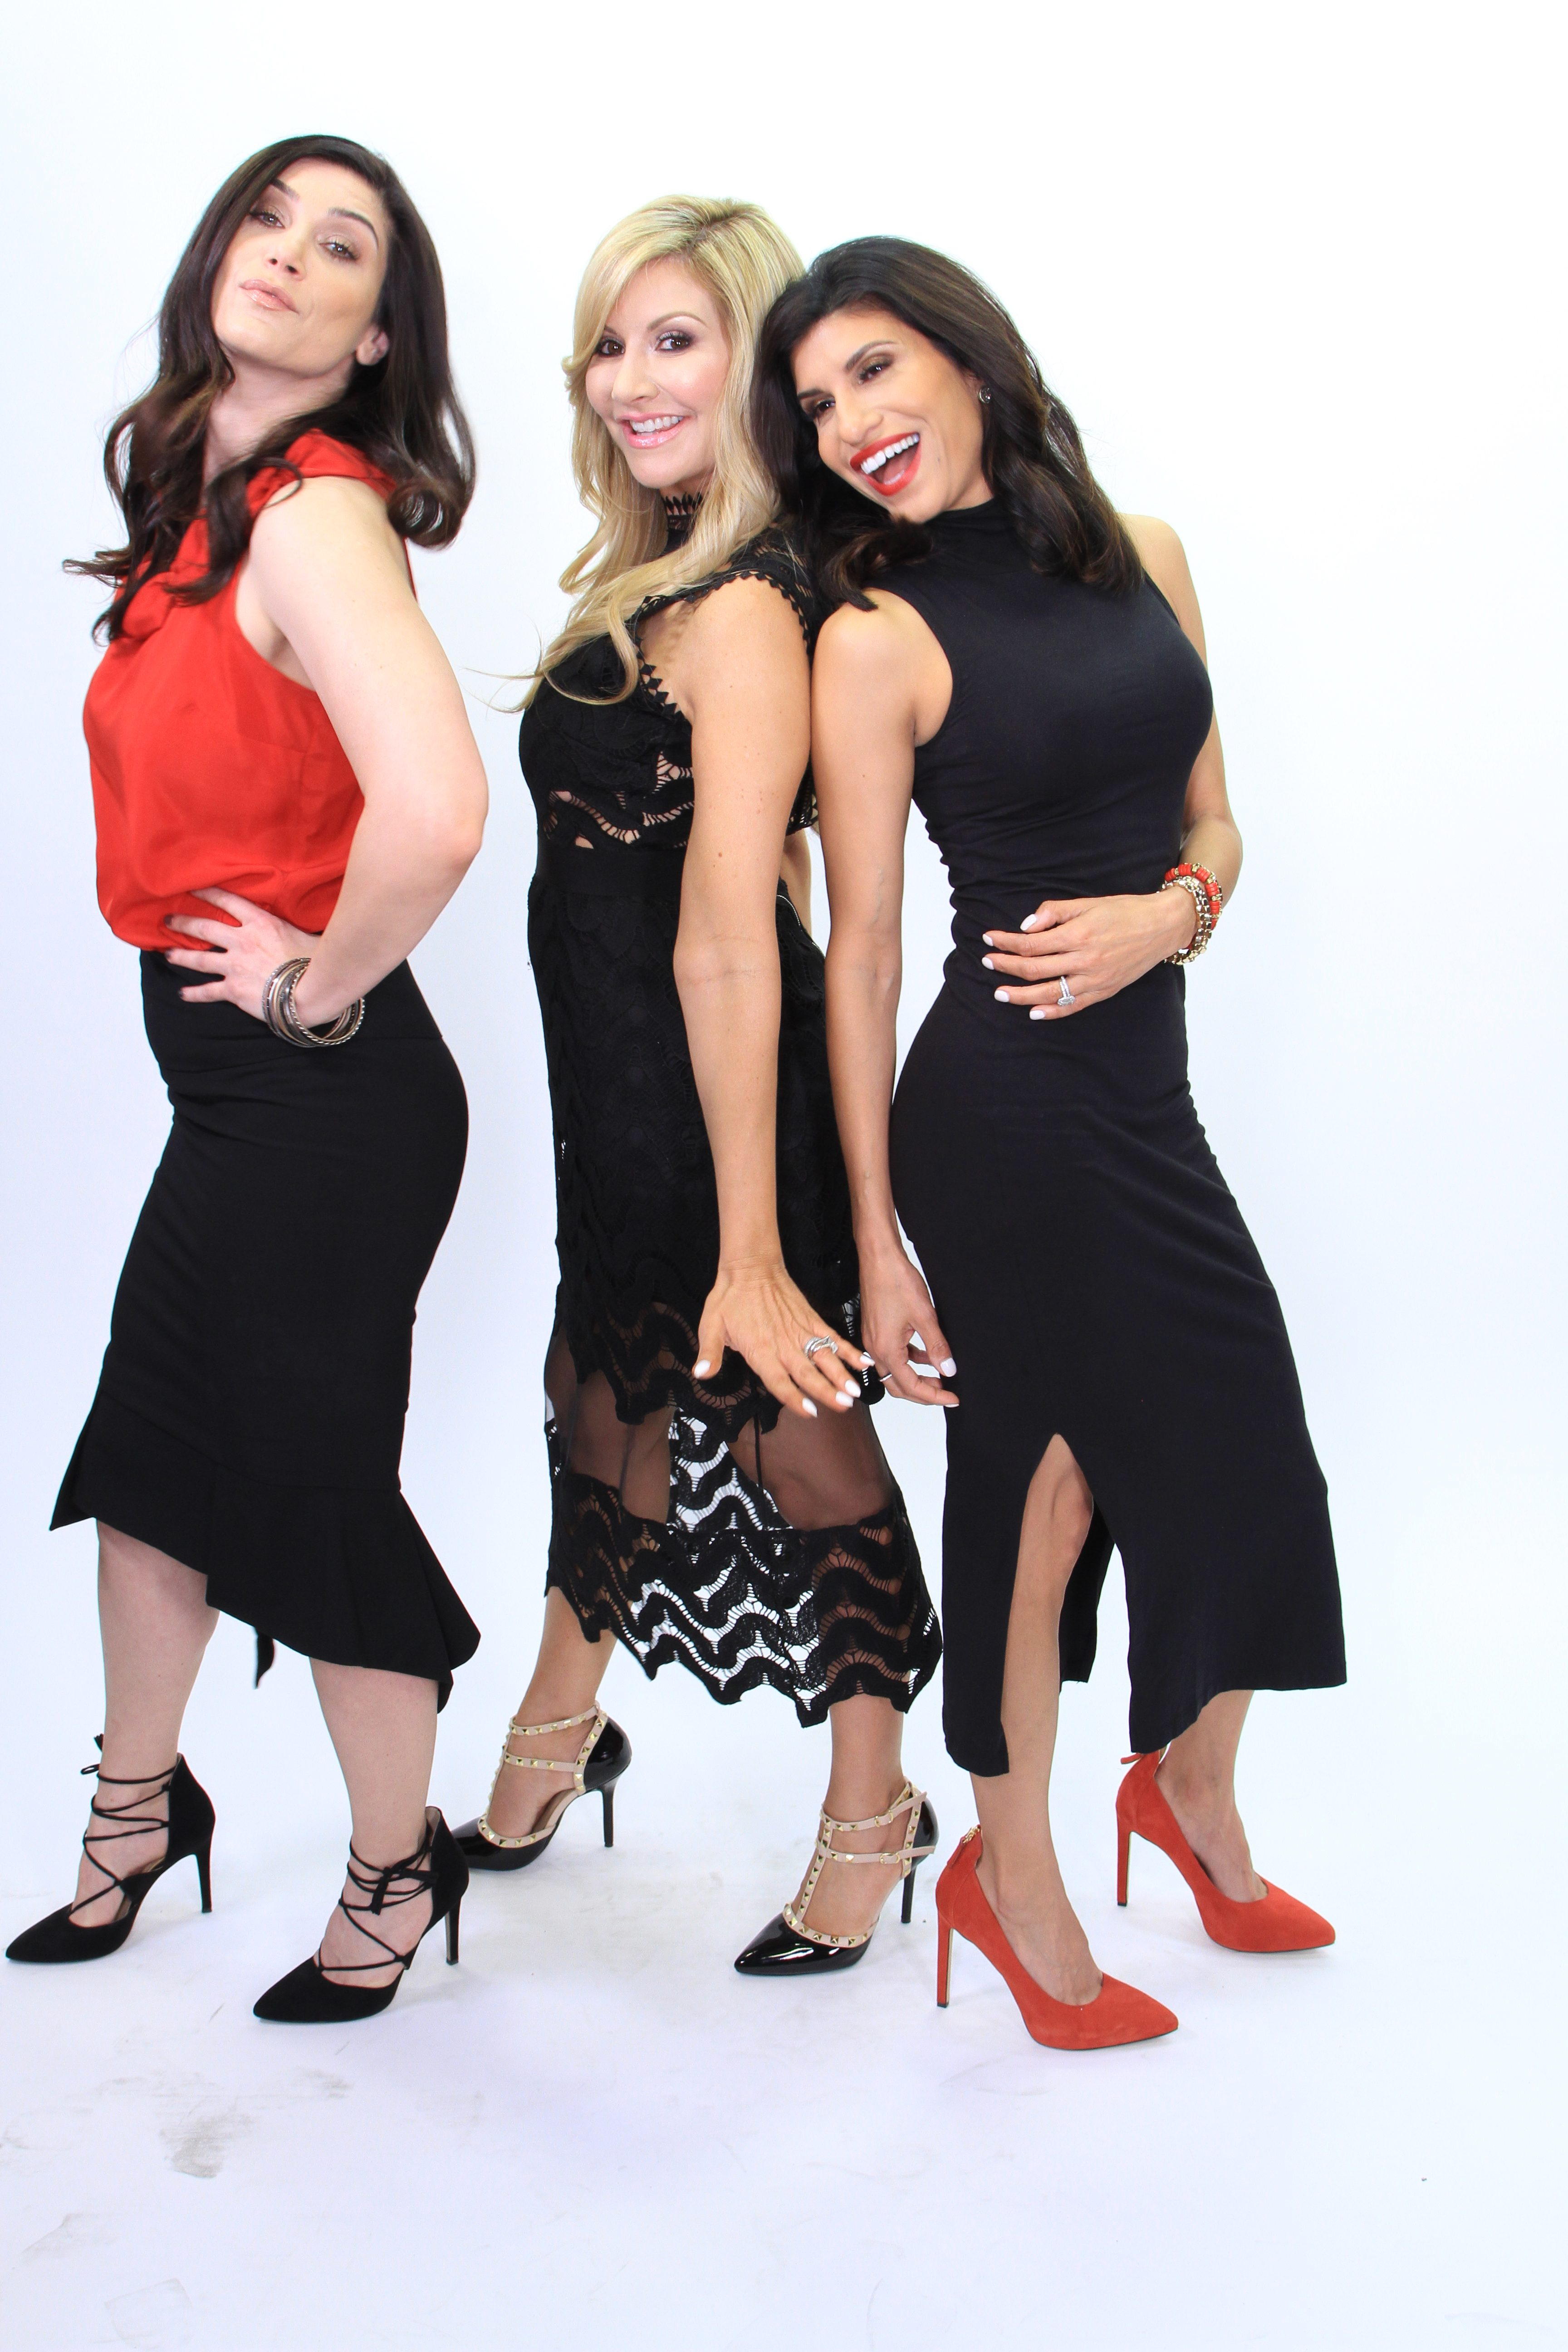 Carey Pena, Zenobia Mertel from Inspired Media 360 and Gelie Akhenblit from Networking Phoenix